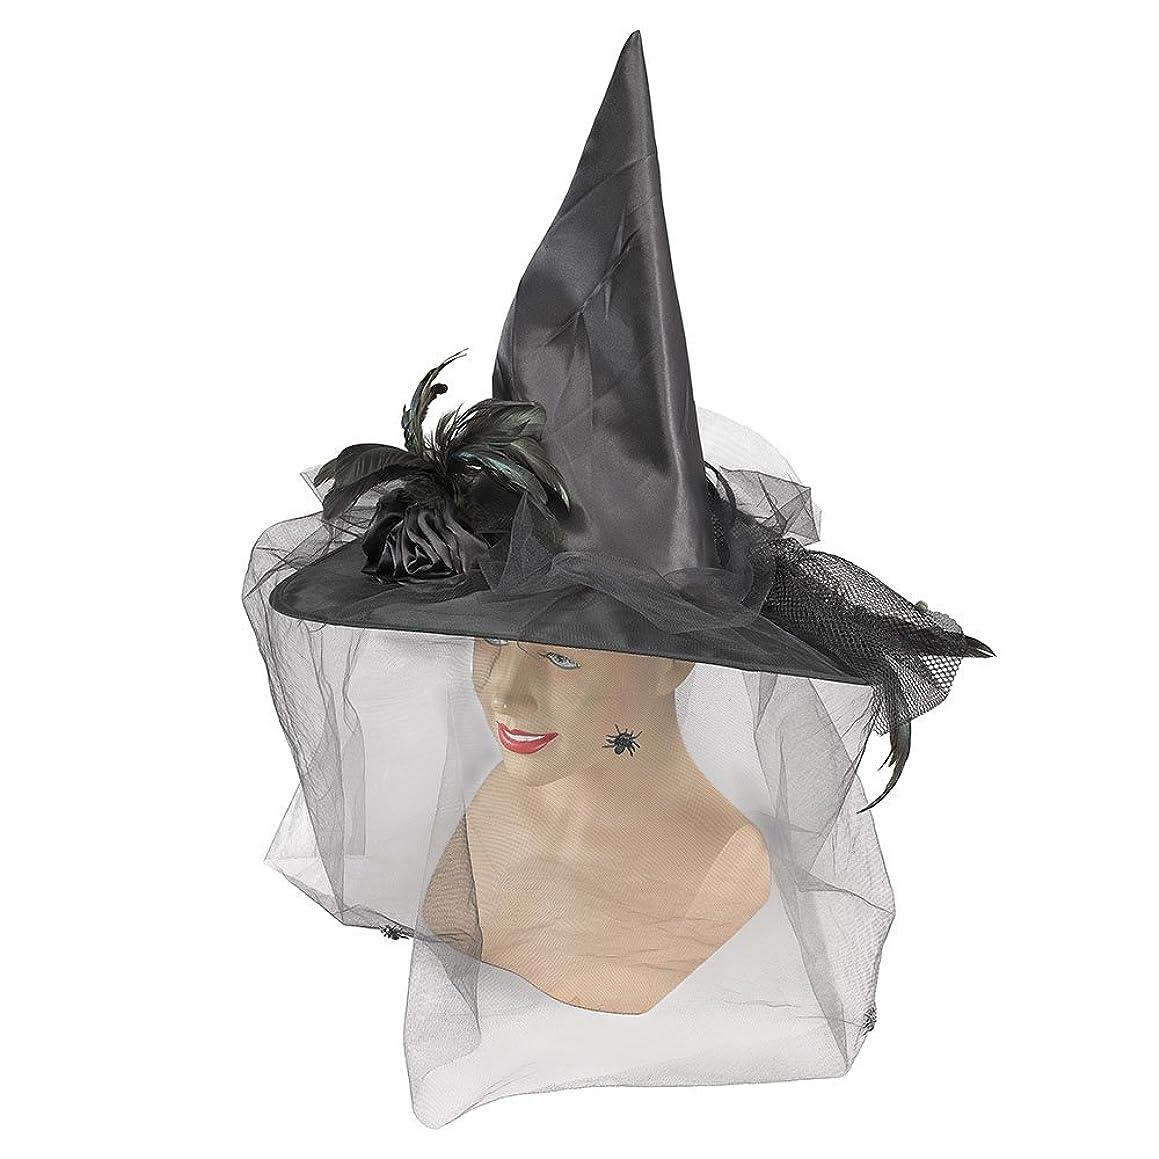 Bristol Novelty BH422 Witch Hat Black, Womens, One Size